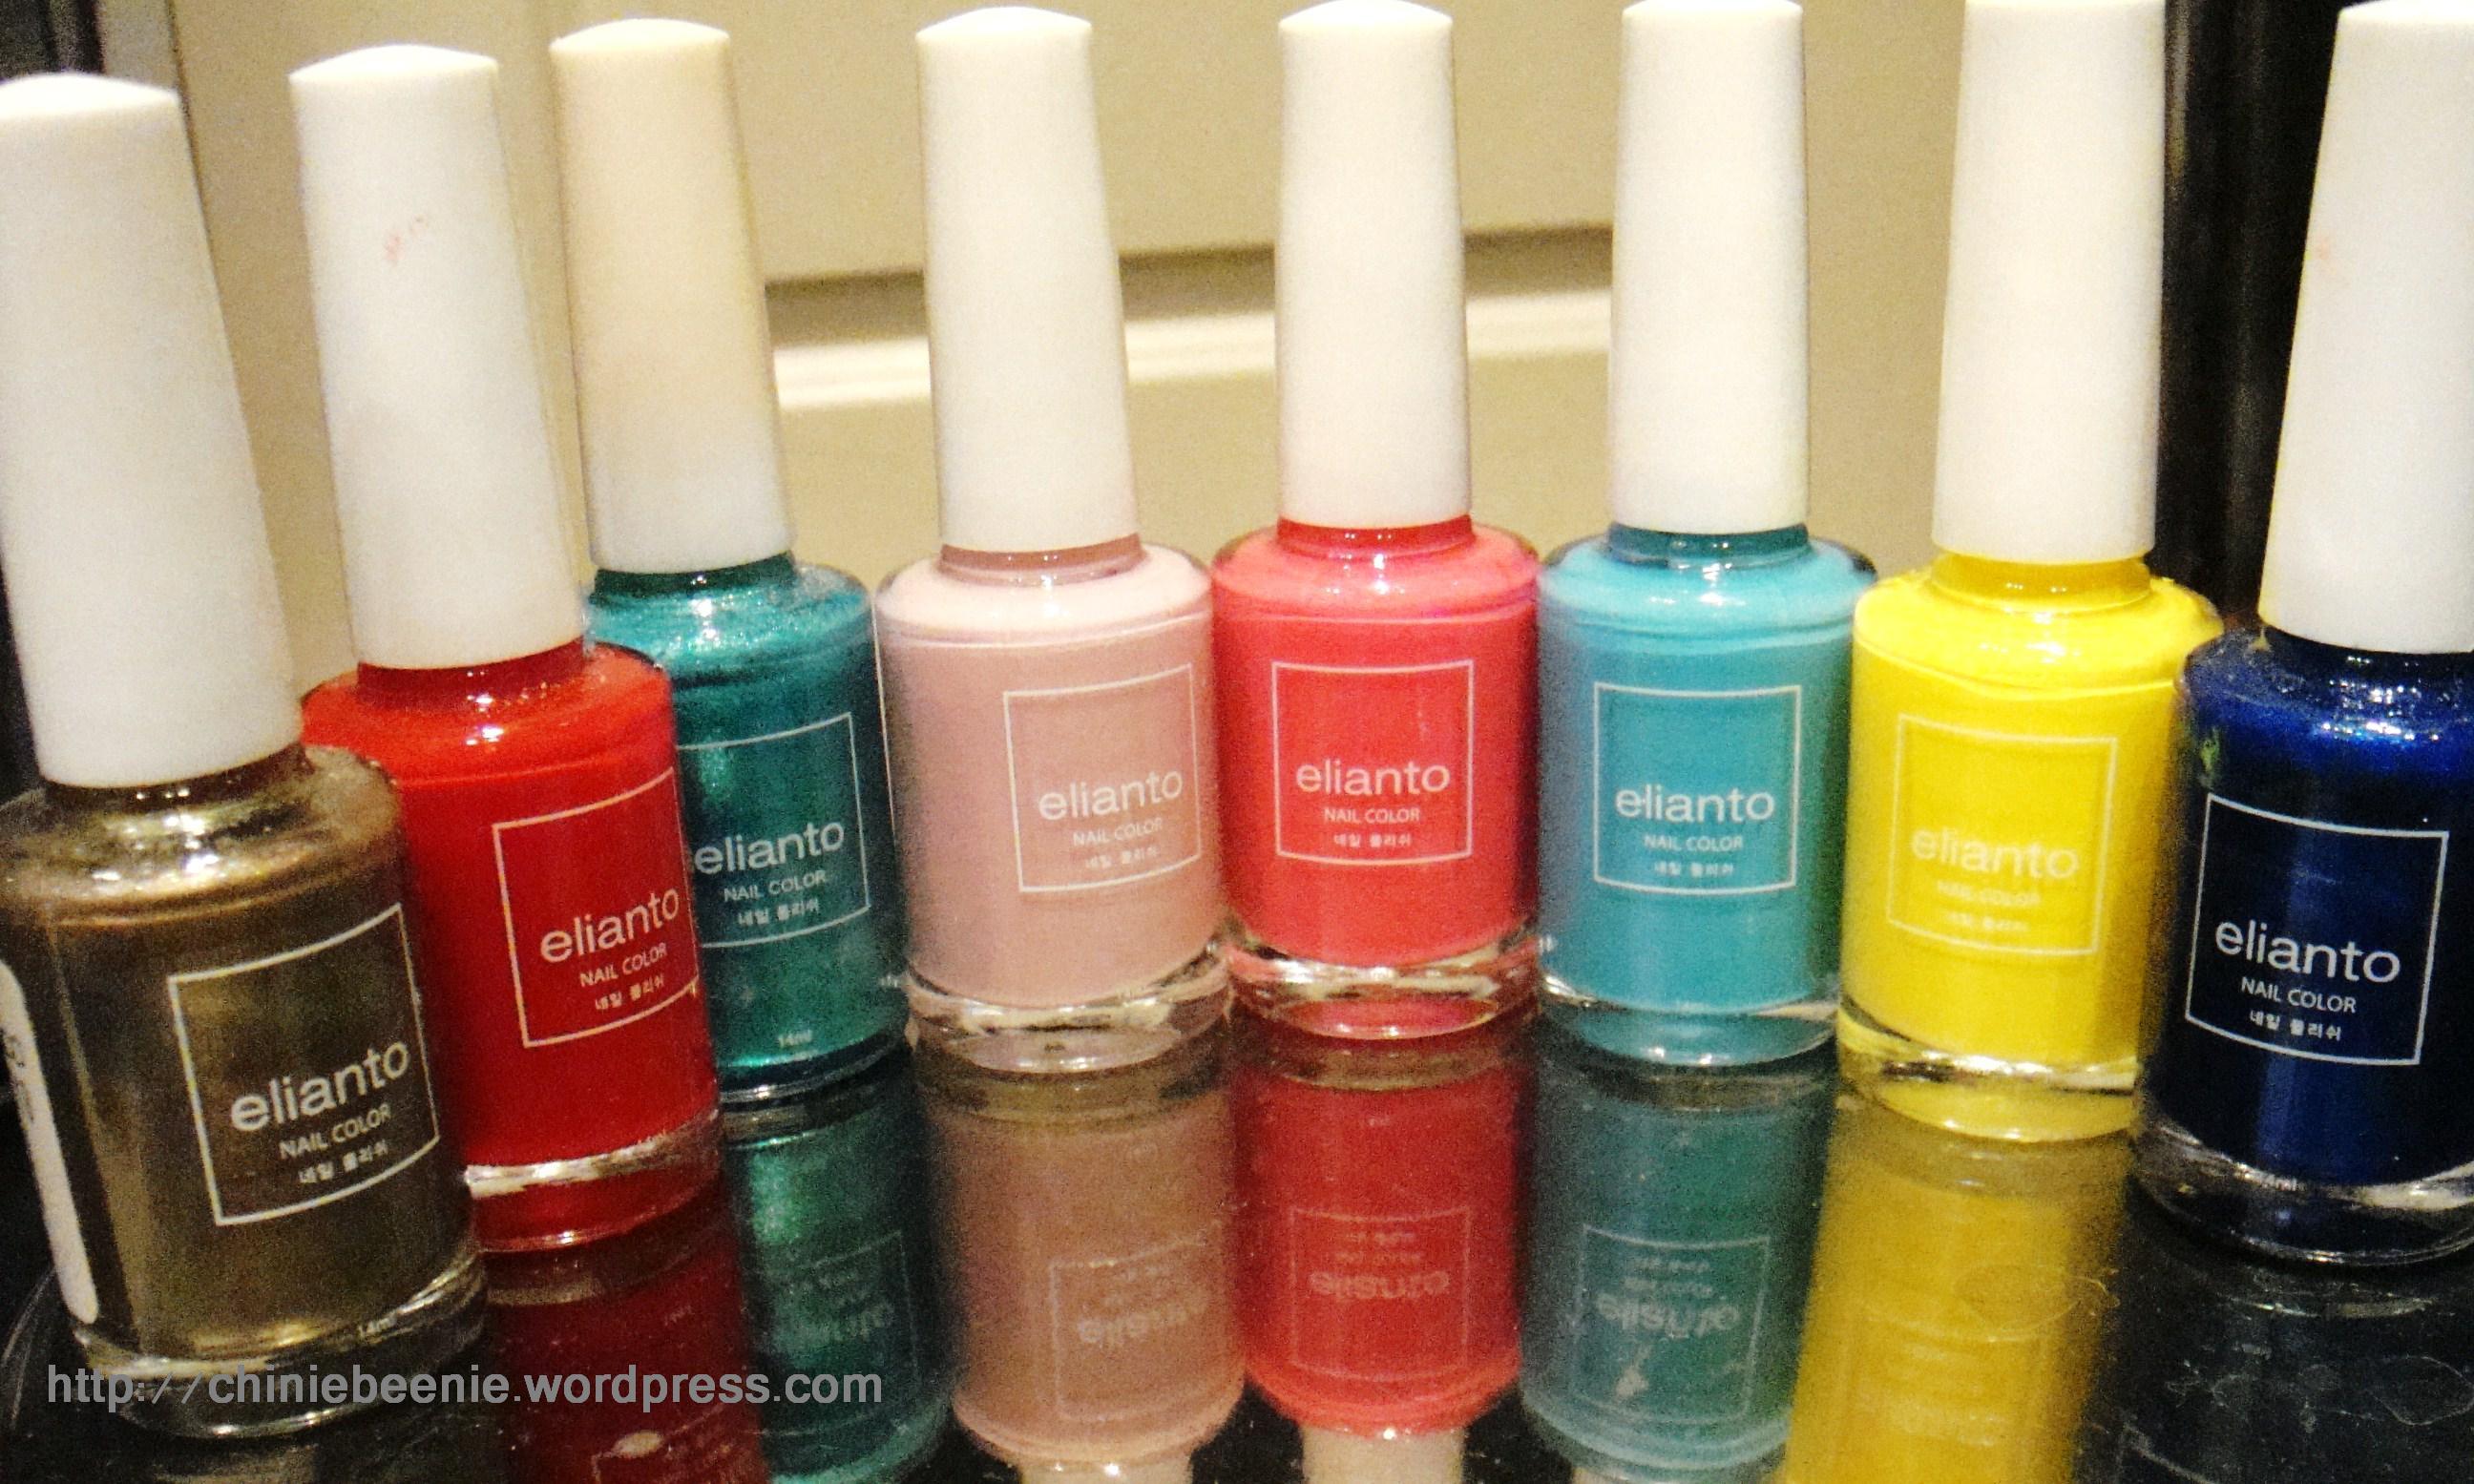 Tried & Tested: Elianto Nail Color